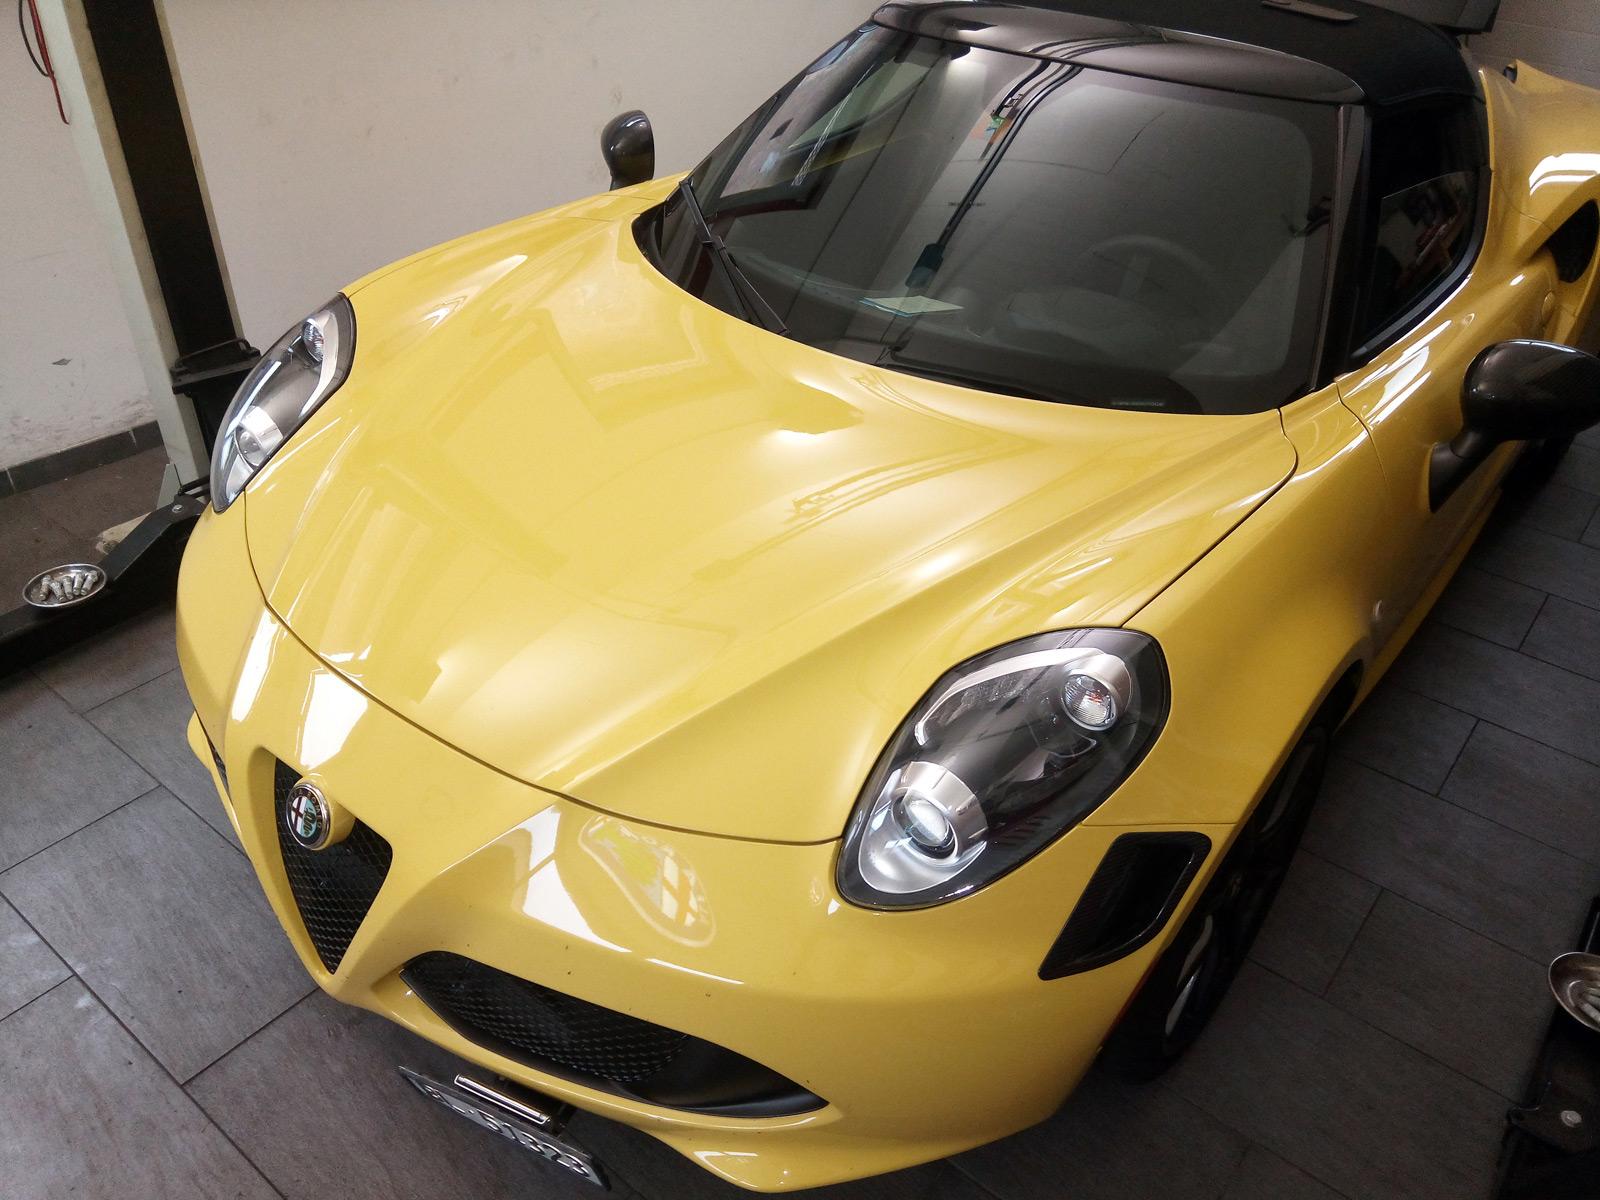 Italienische Klassiker und Sportwagen